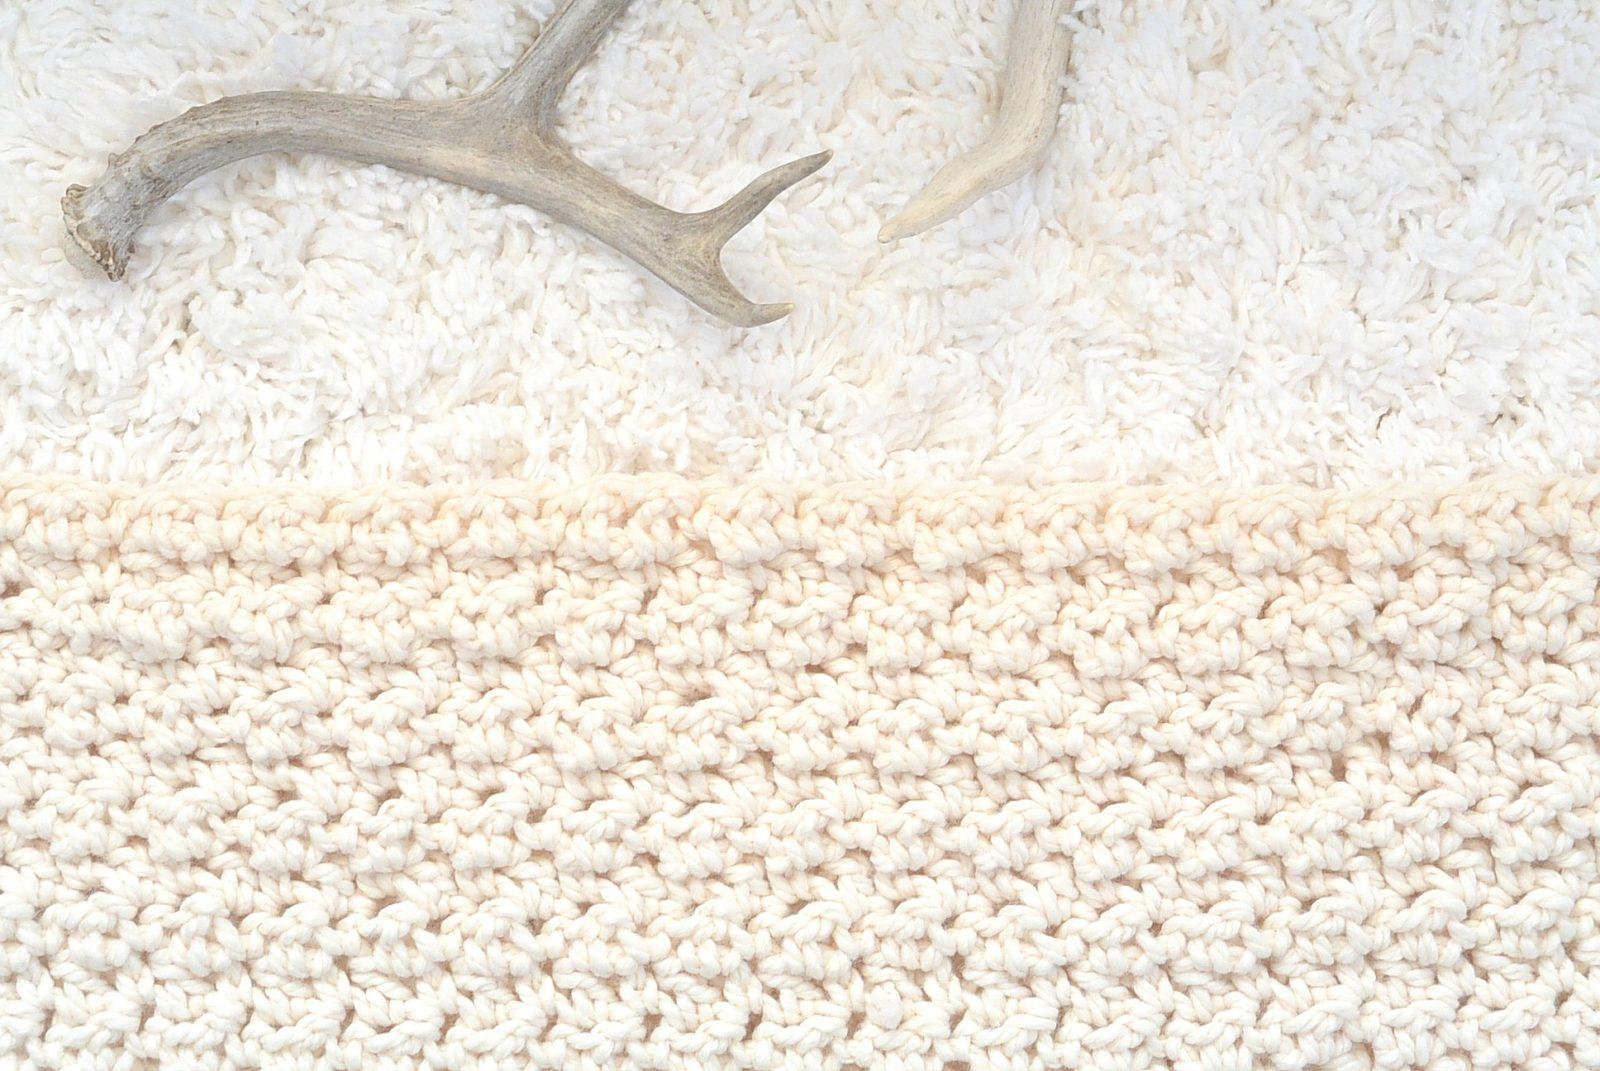 Crochet Stitches Chunky : Chunky Icelandic Crochet Blanket Pattern - Mama In A Stitch